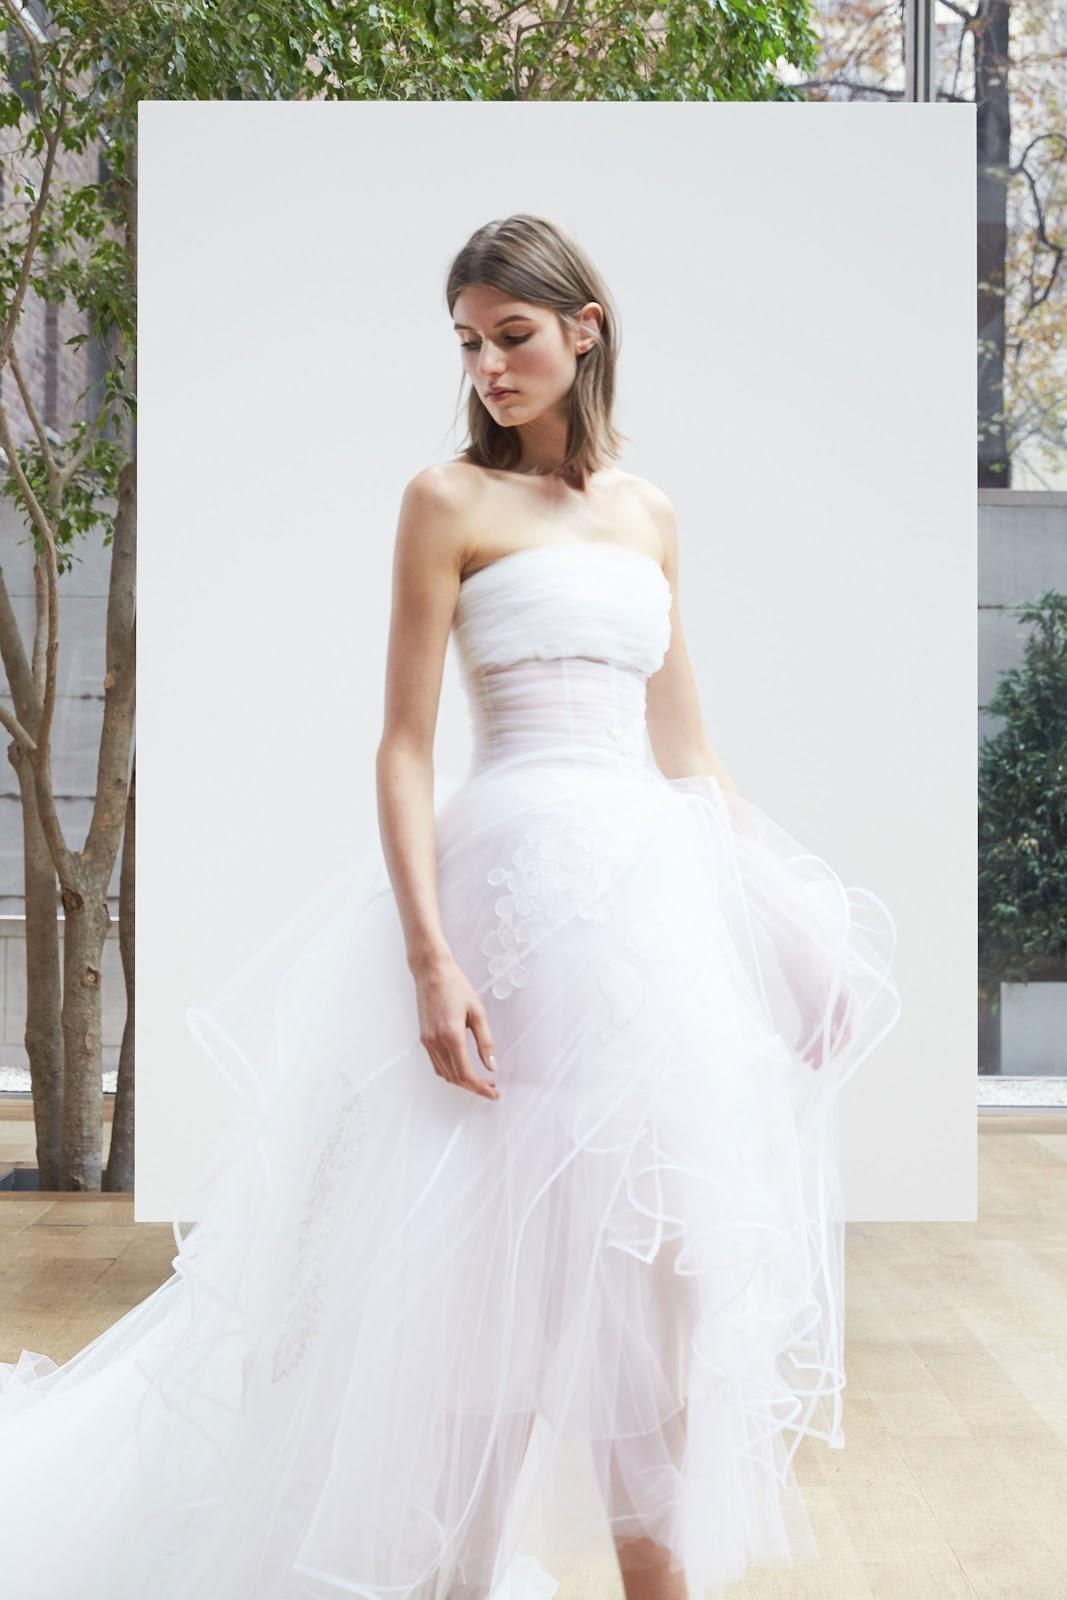 Wedding oscar de la renta bridal spring 2018 cool chic style wedding oscar de la renta bridal spring 2018 junglespirit Image collections